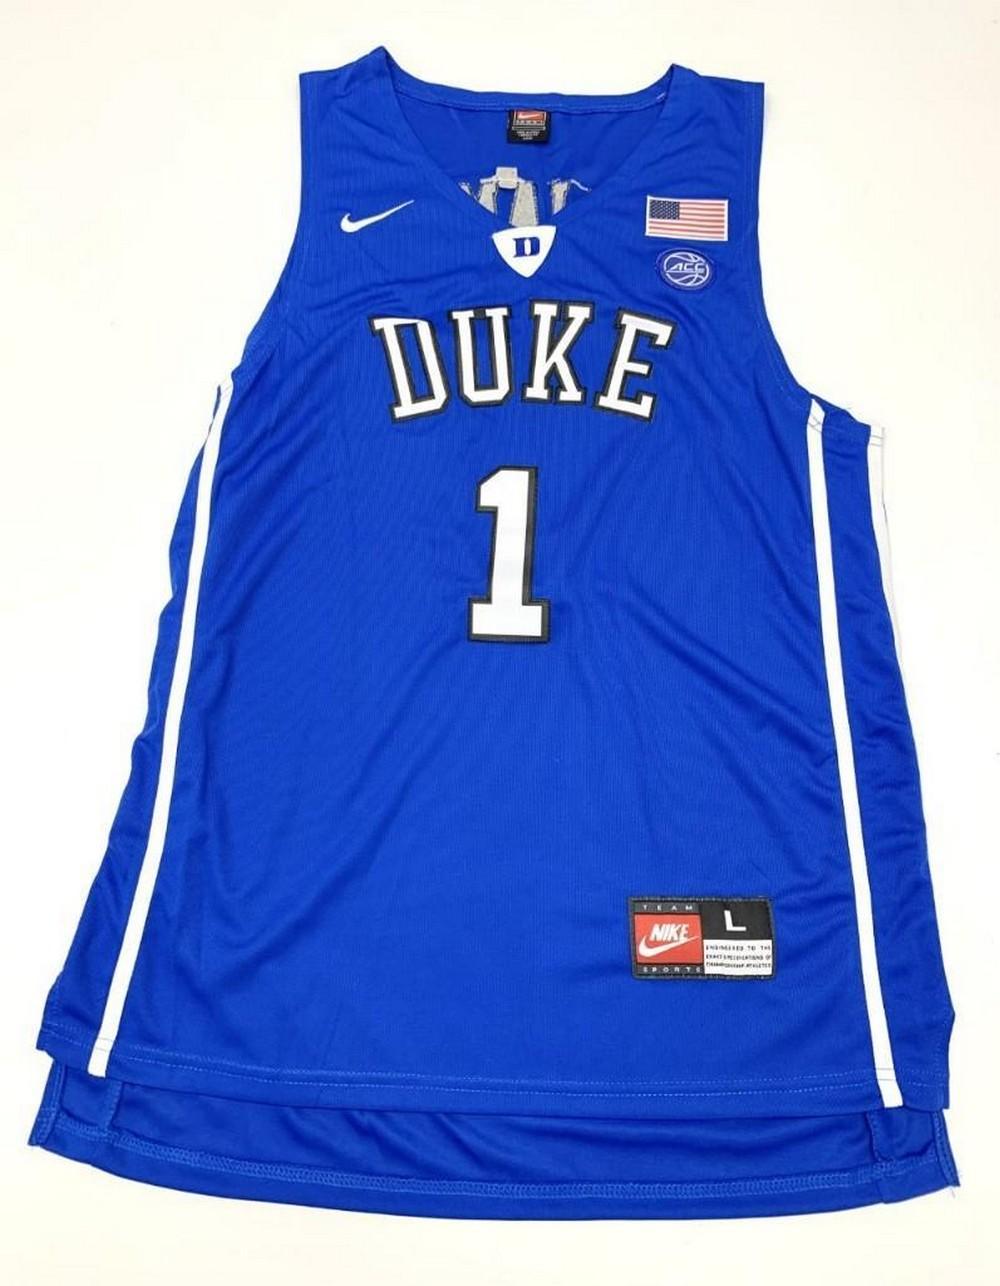 Authentic Zion Williamson #1 Duke University Home Jersey